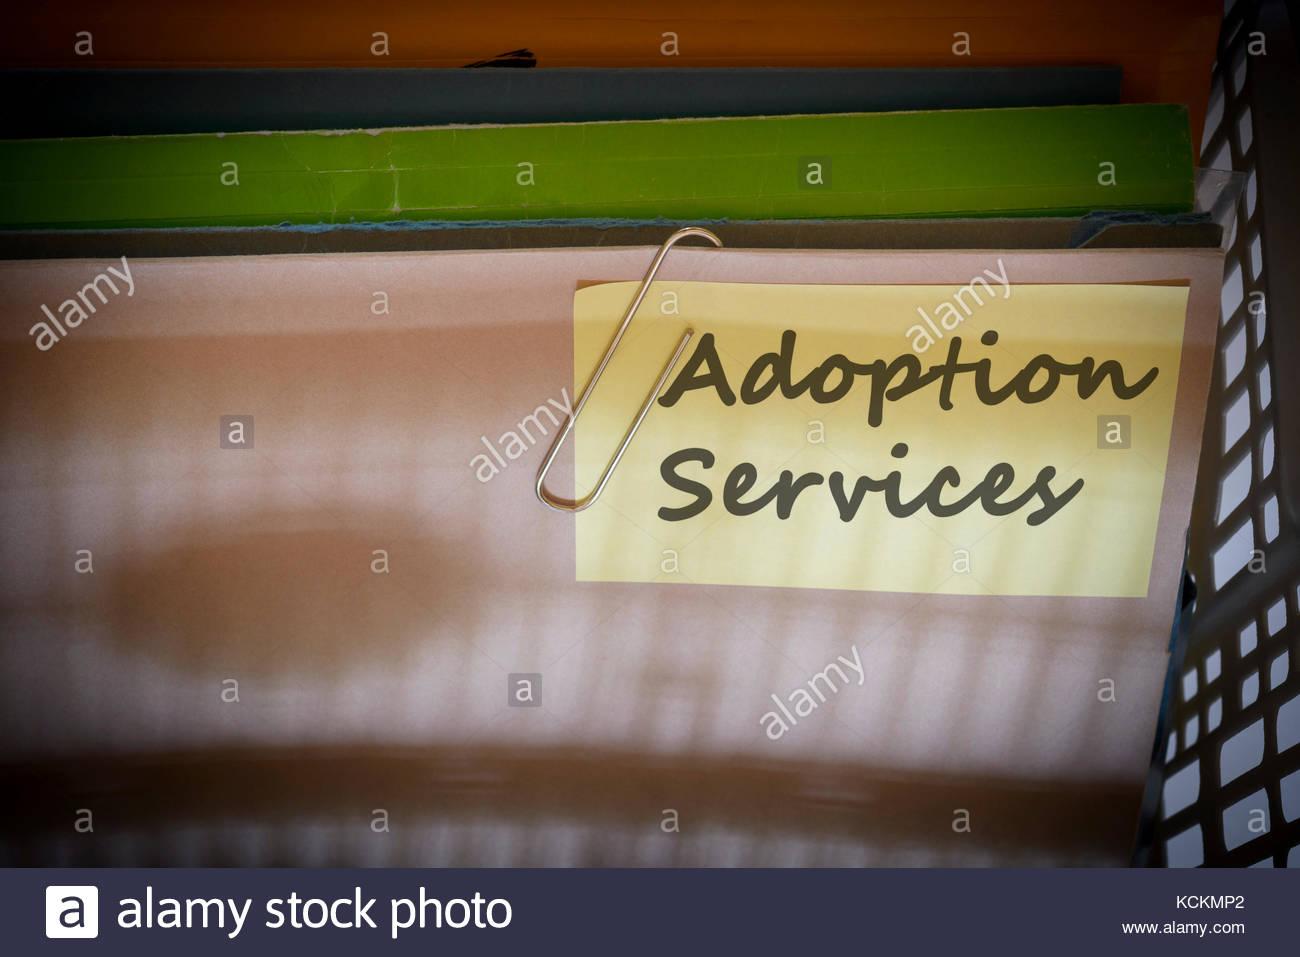 Adoption Services written on document folder, Dorset, England. - Stock Image